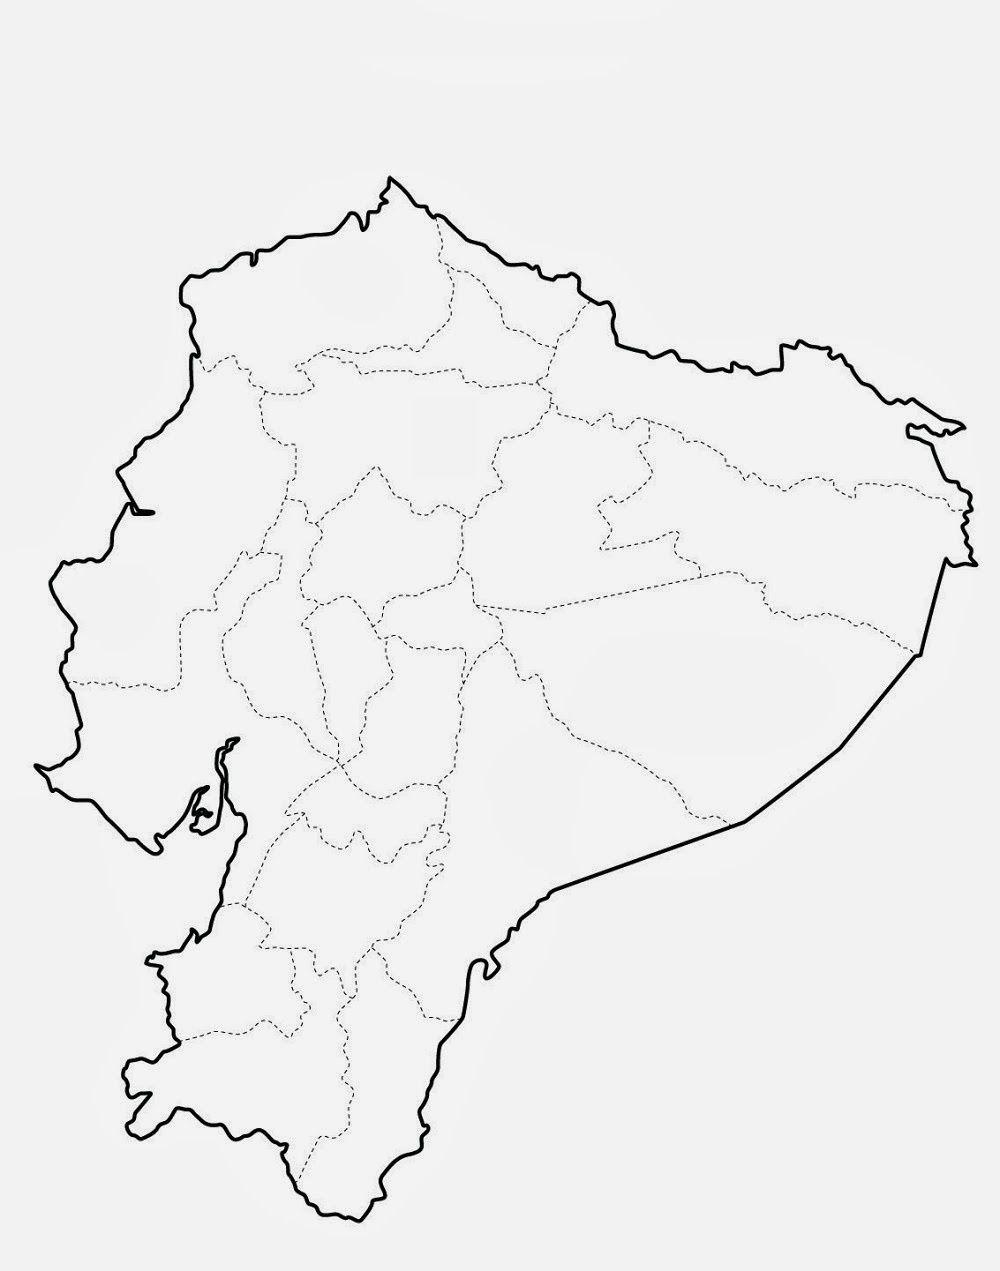 Mapa Politico Del Ecuador Actual Sin Nombres Buscar Con Google Love Messages Map Motivational Phrases